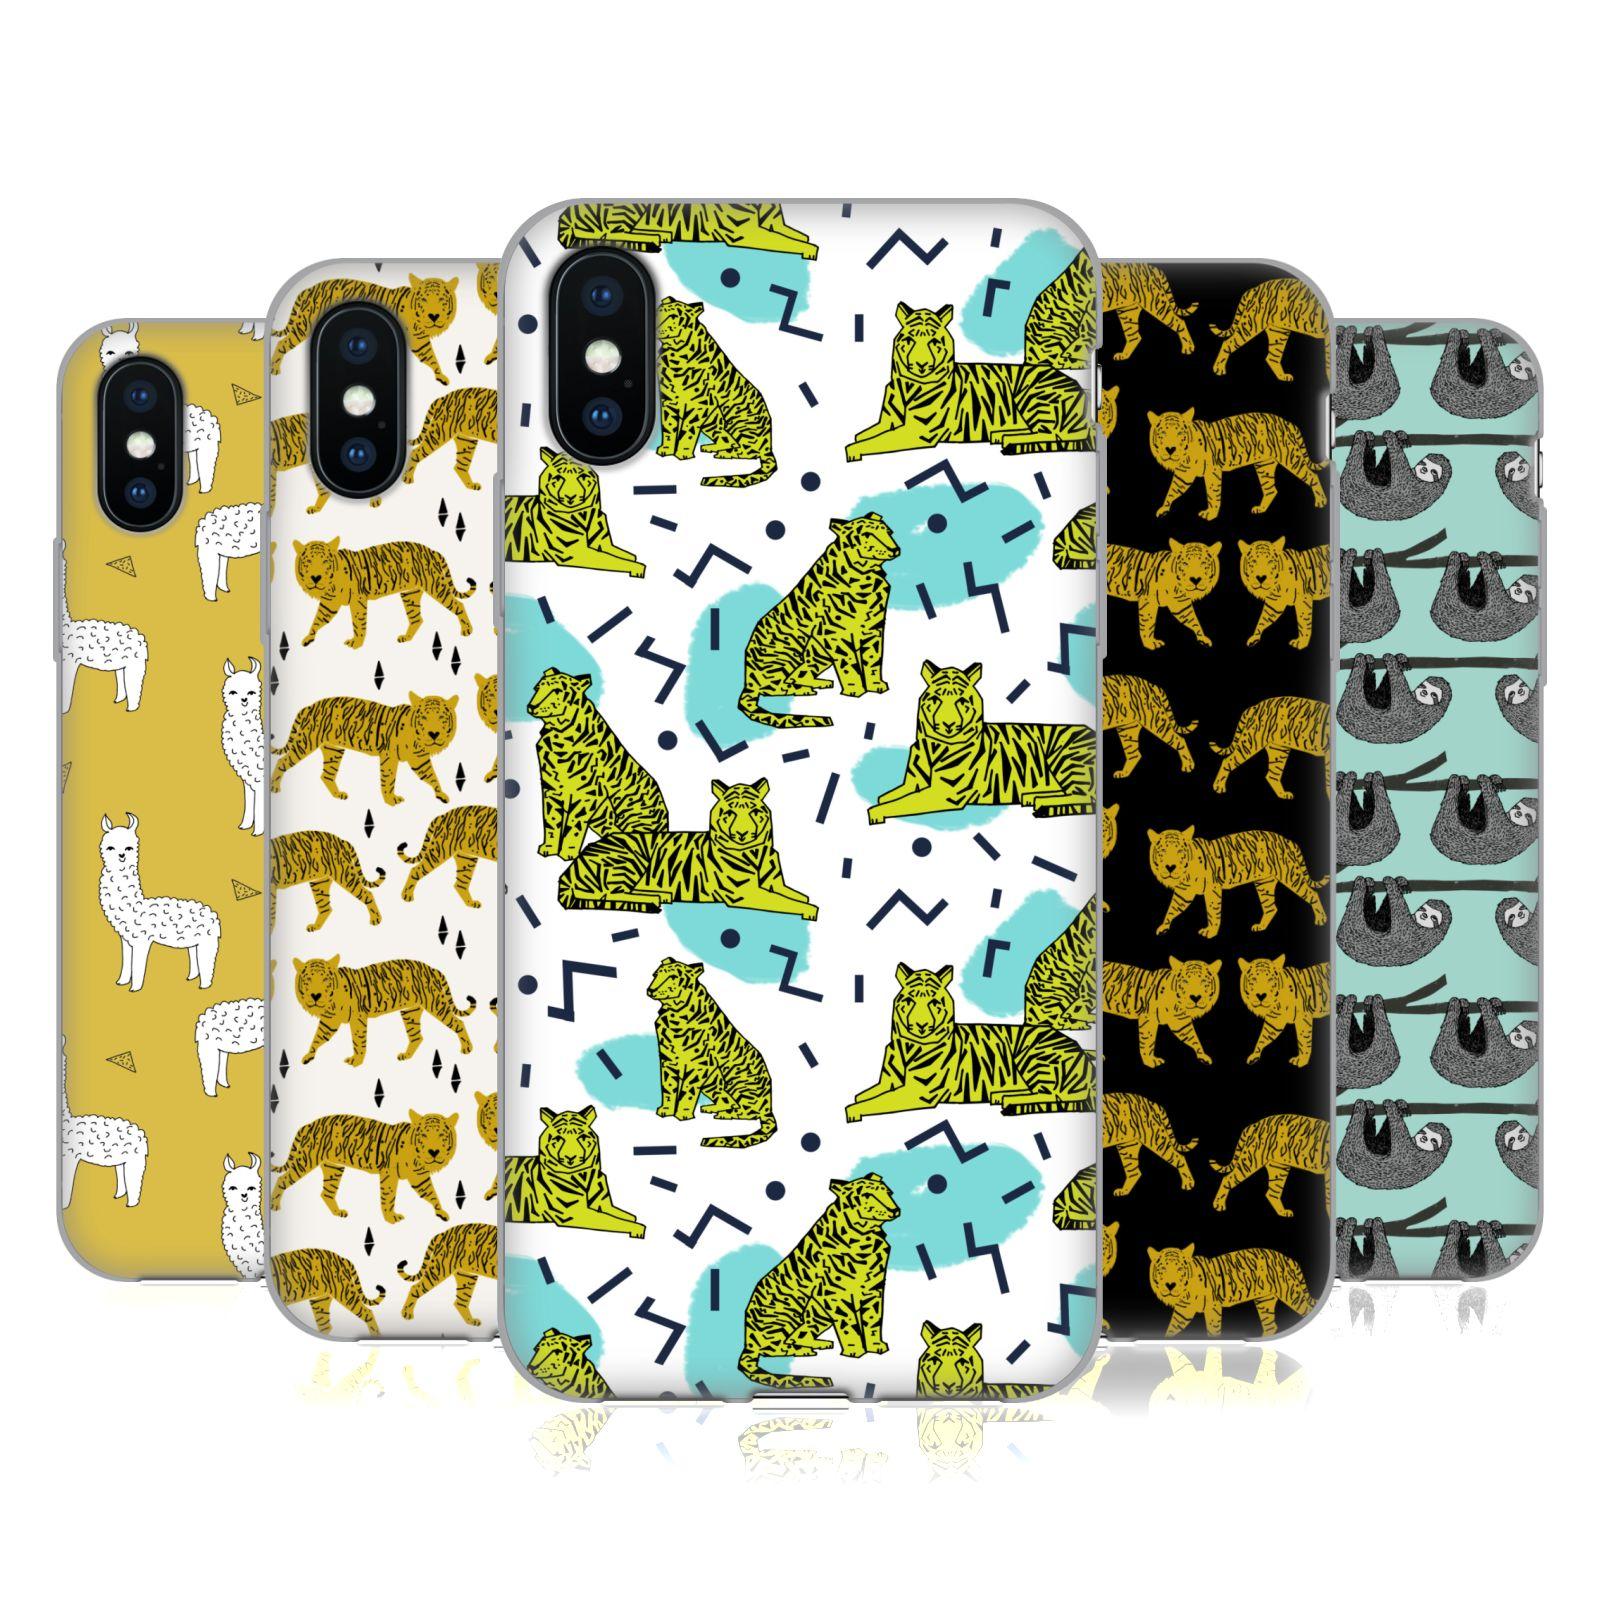 Andrea Lauren Design <!--translate-lineup-->Animals<!--translate-lineup-->